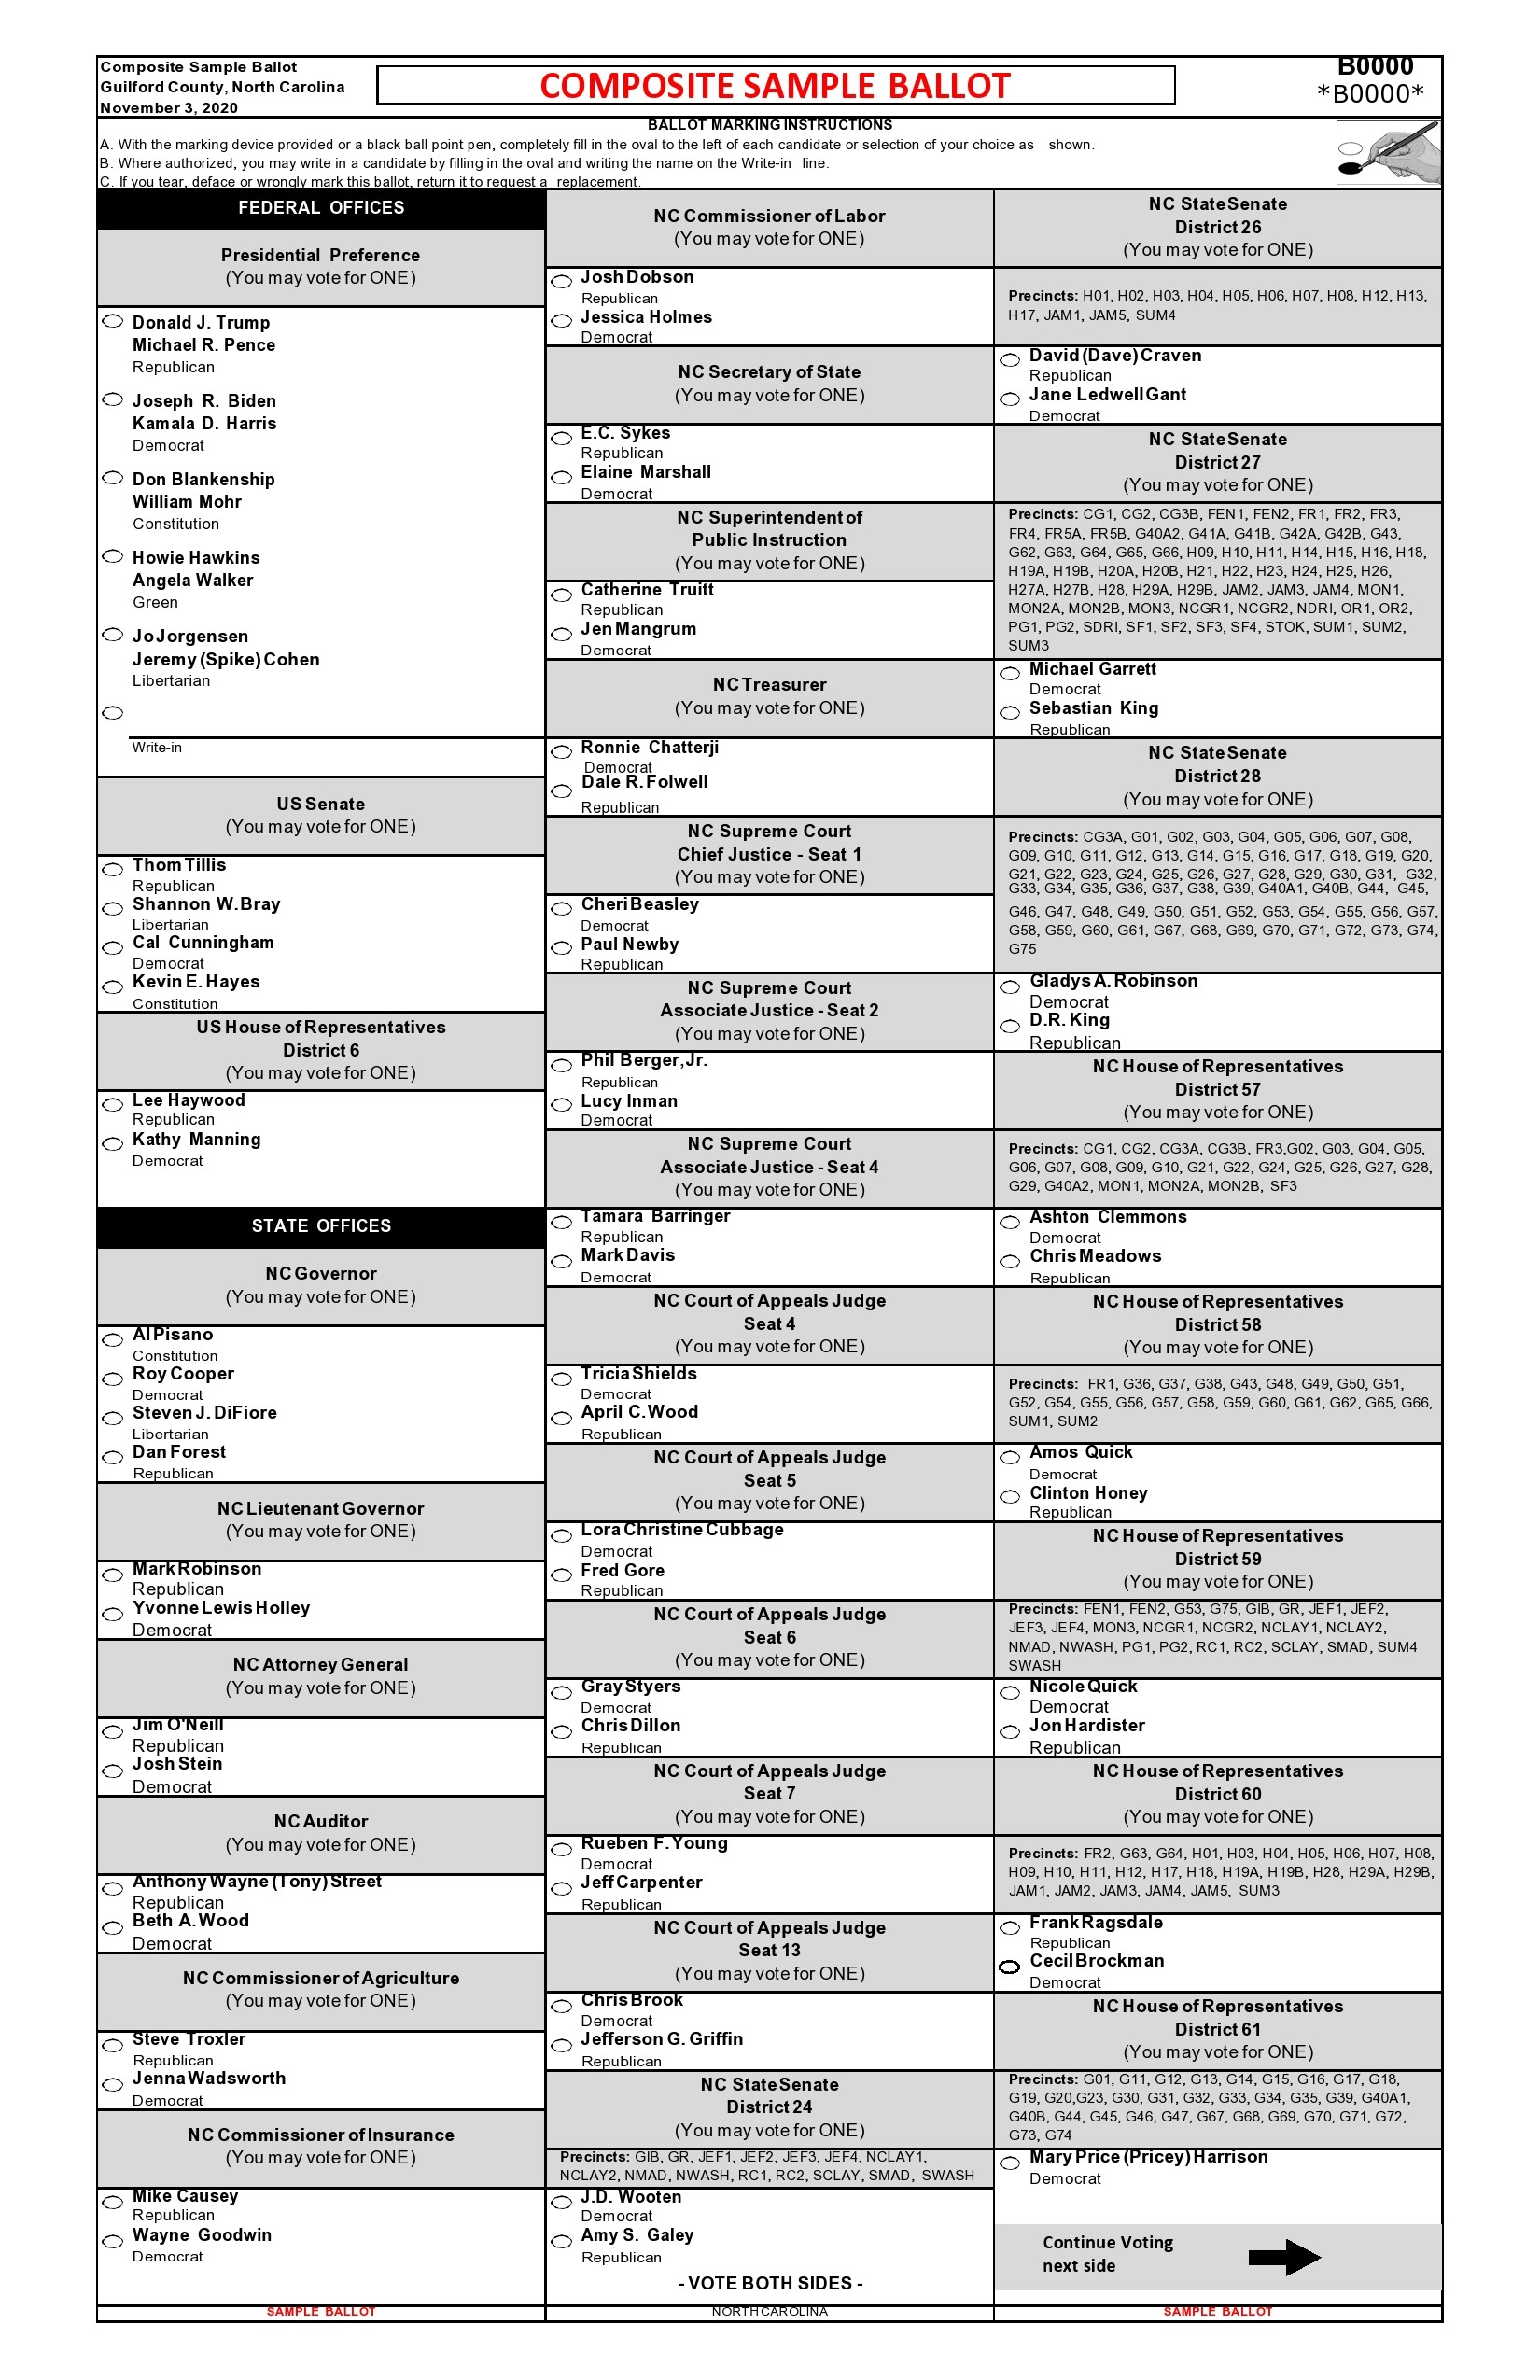 Free ballot template 21